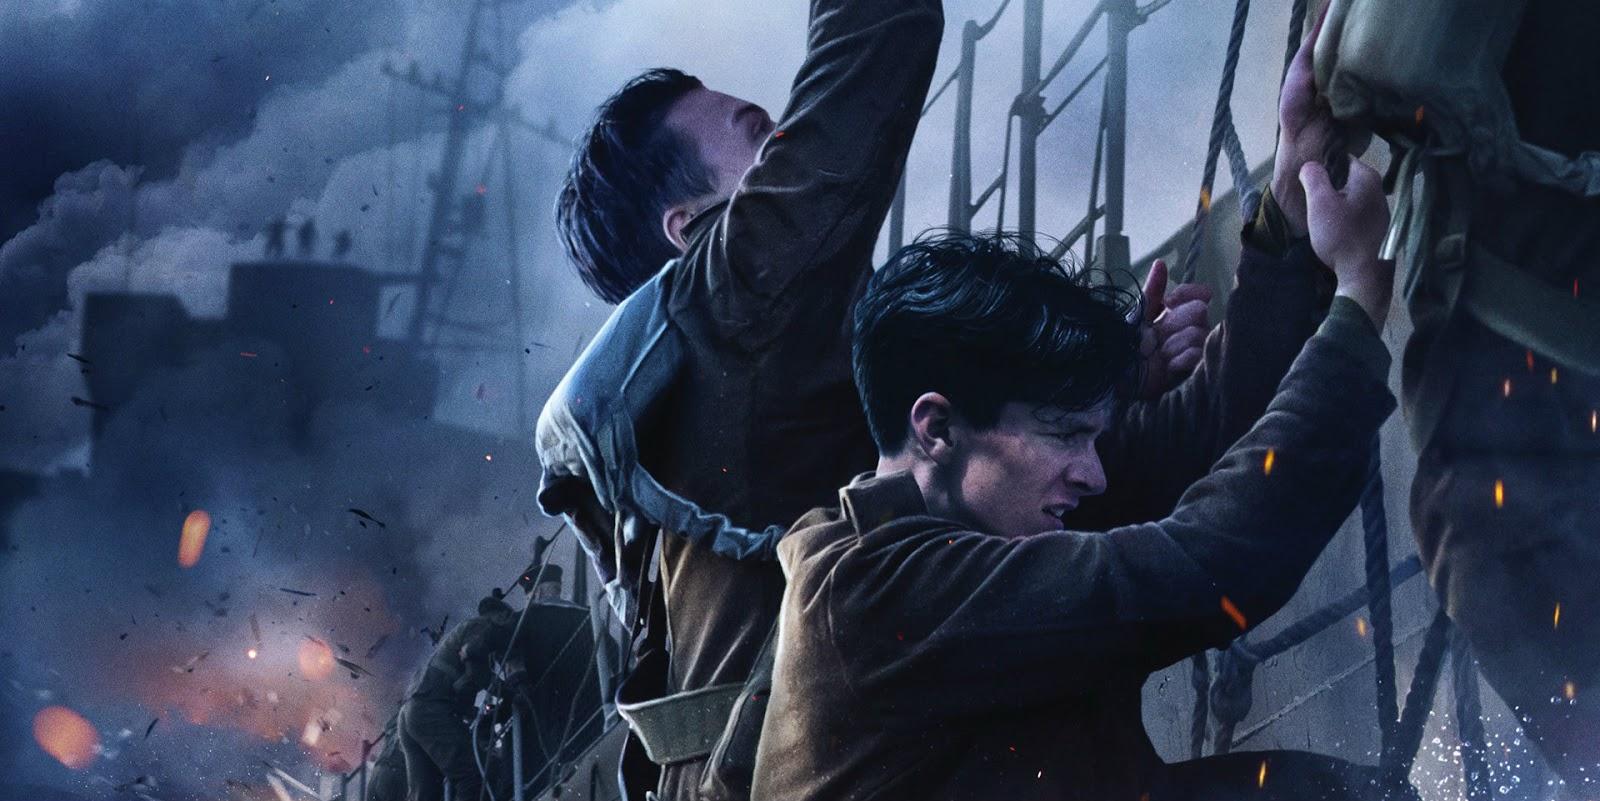 Crítica: \'Dunkerque\' (2017), de Christopher Nolan   Los Lunes Seriéfilos